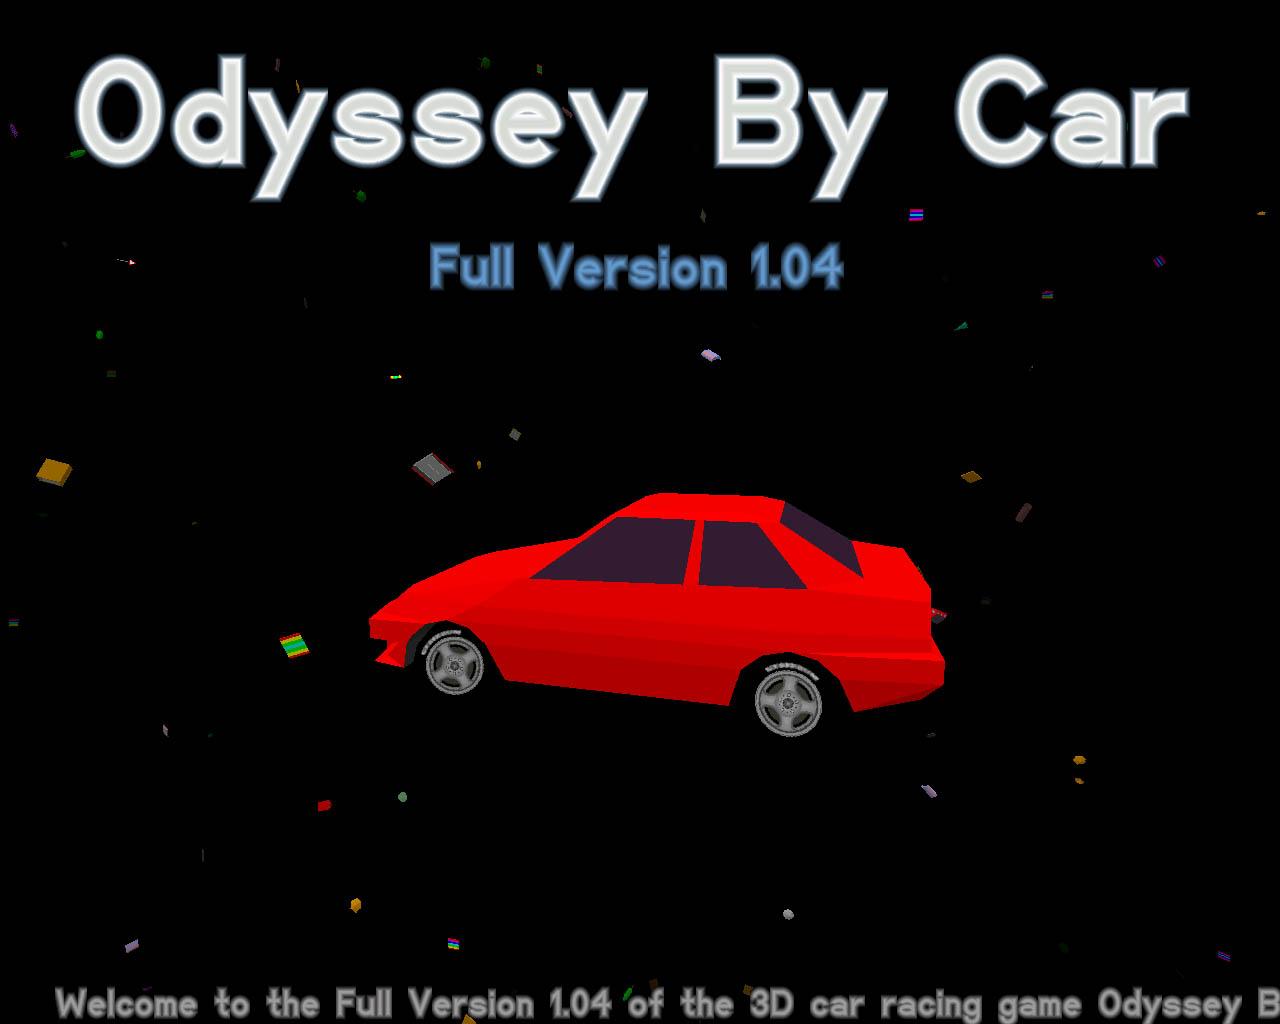 odyssey-by-car-1